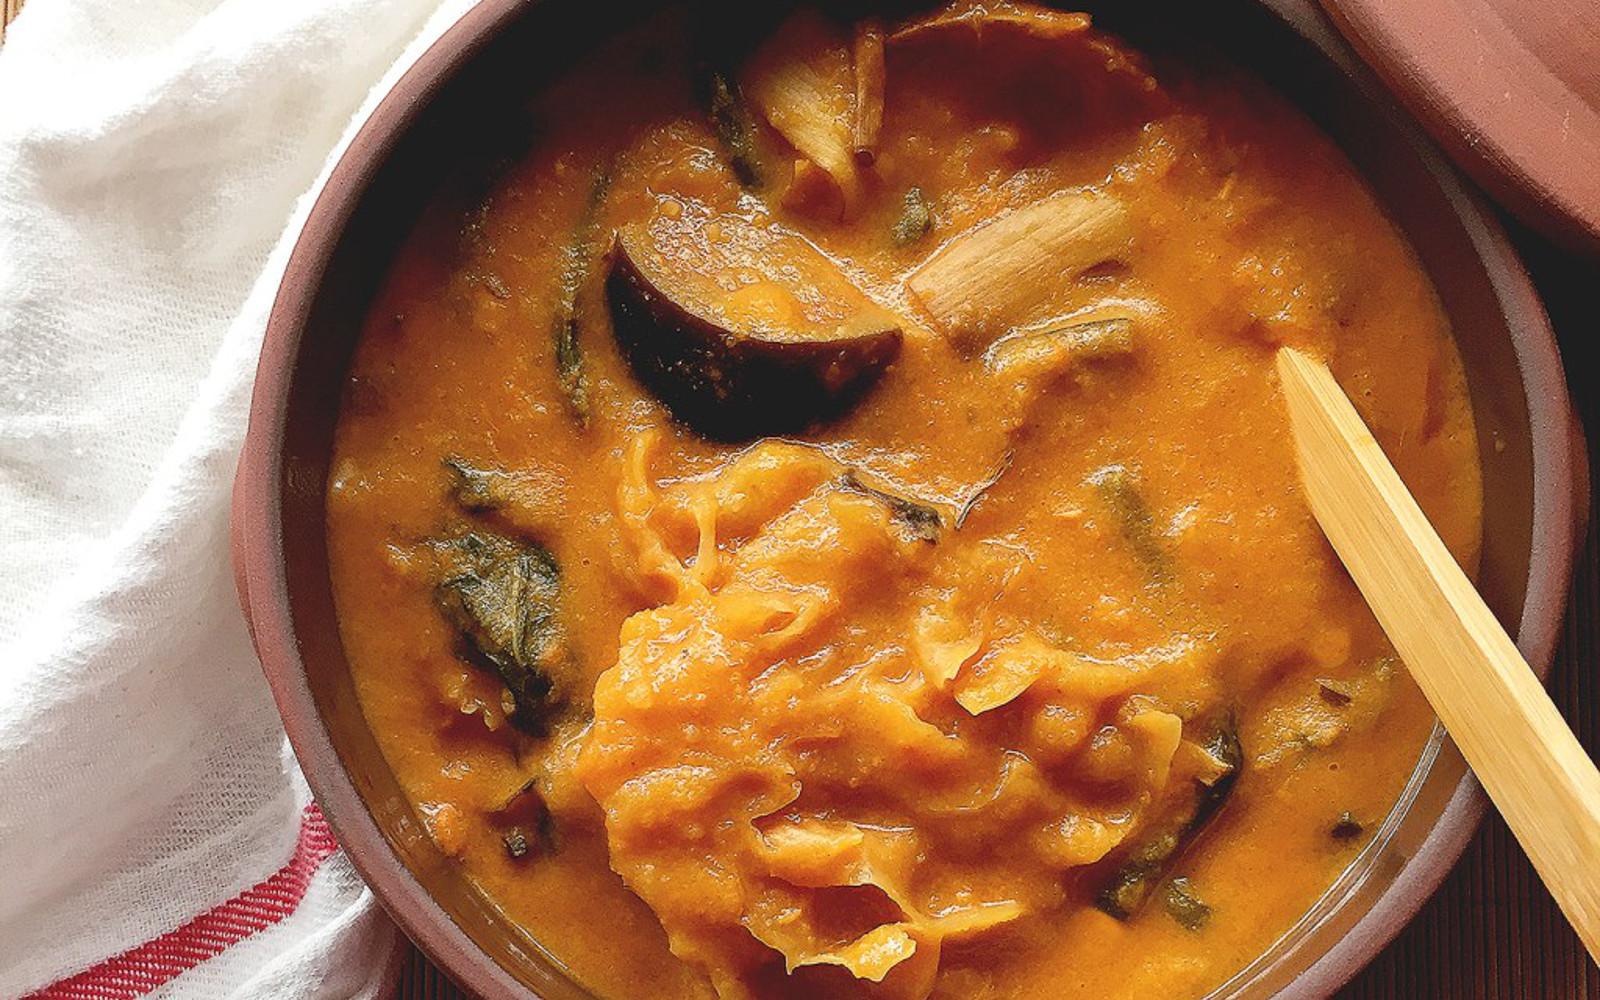 Vegan Kare-Kare: Filipino Vegetable Stew in Peanut-Based Sauce